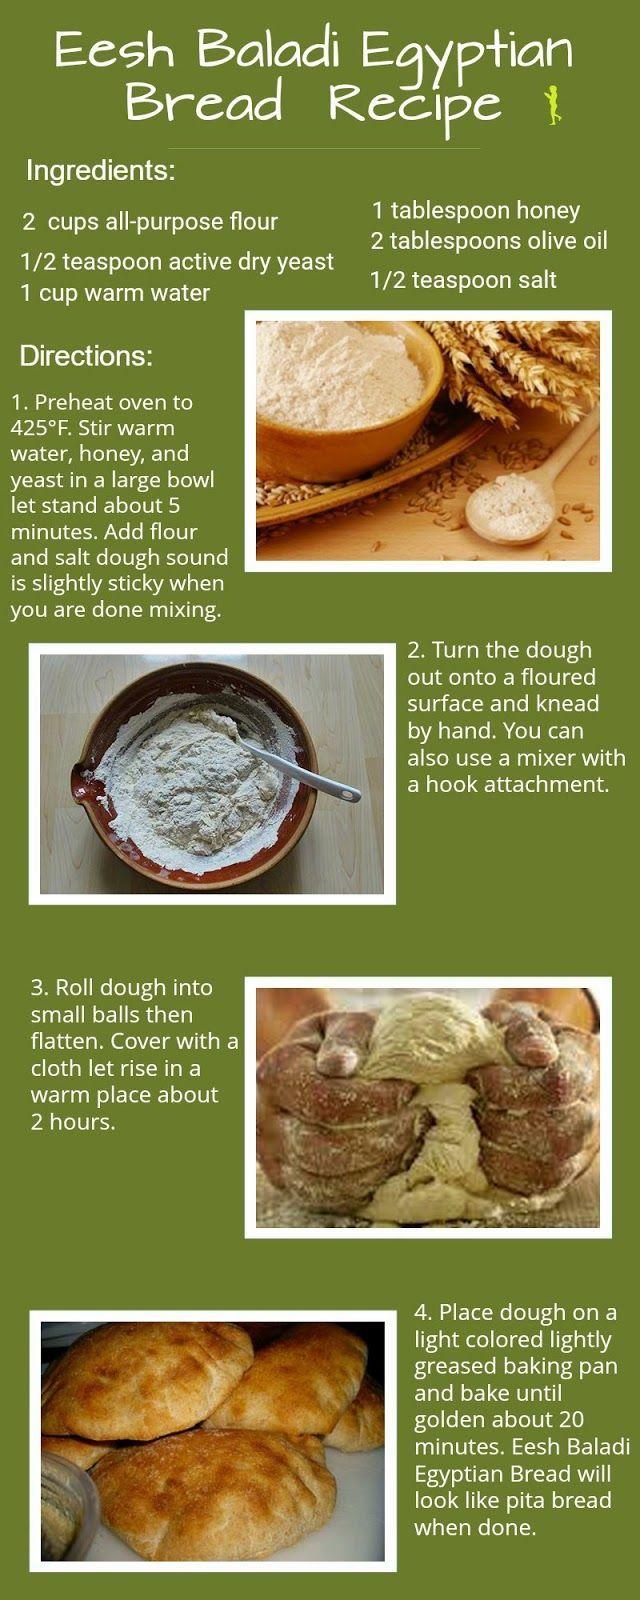 Simple eesh baladi egyptian bread recipe directions egyptian simple eesh baladi egyptian bread recipe directions forumfinder Images